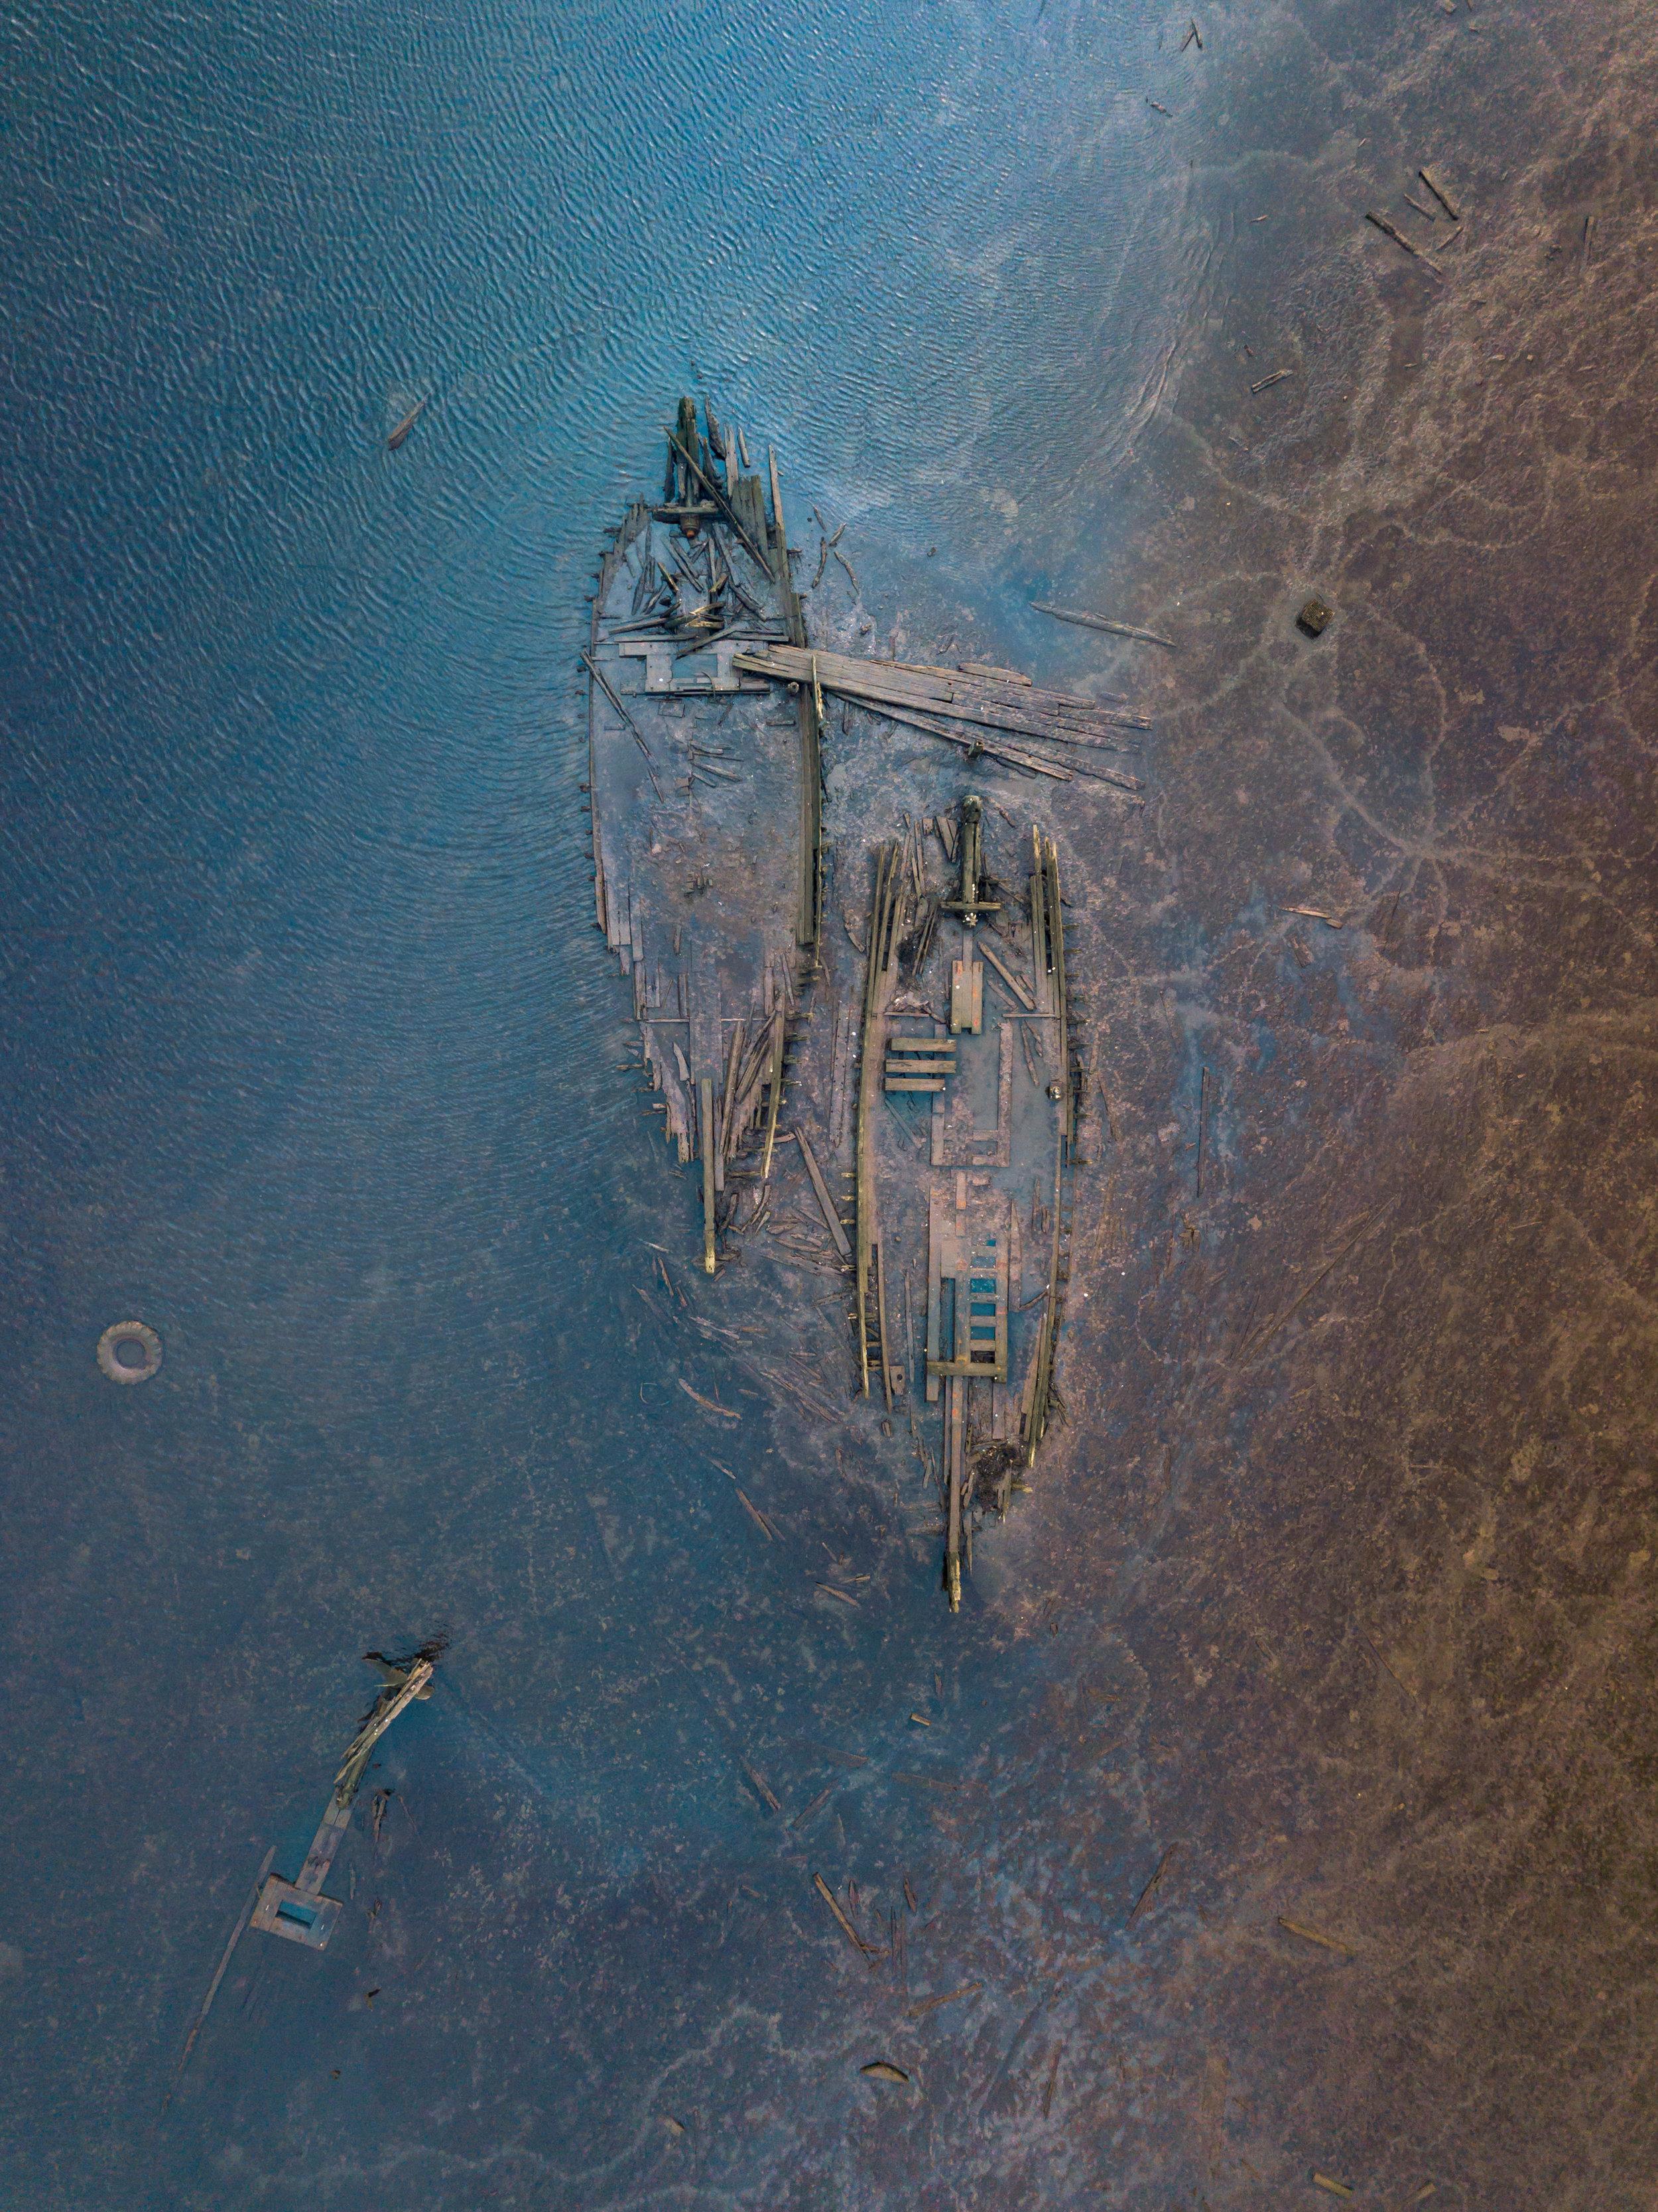 shallowwater_typoland_aerial.jpg